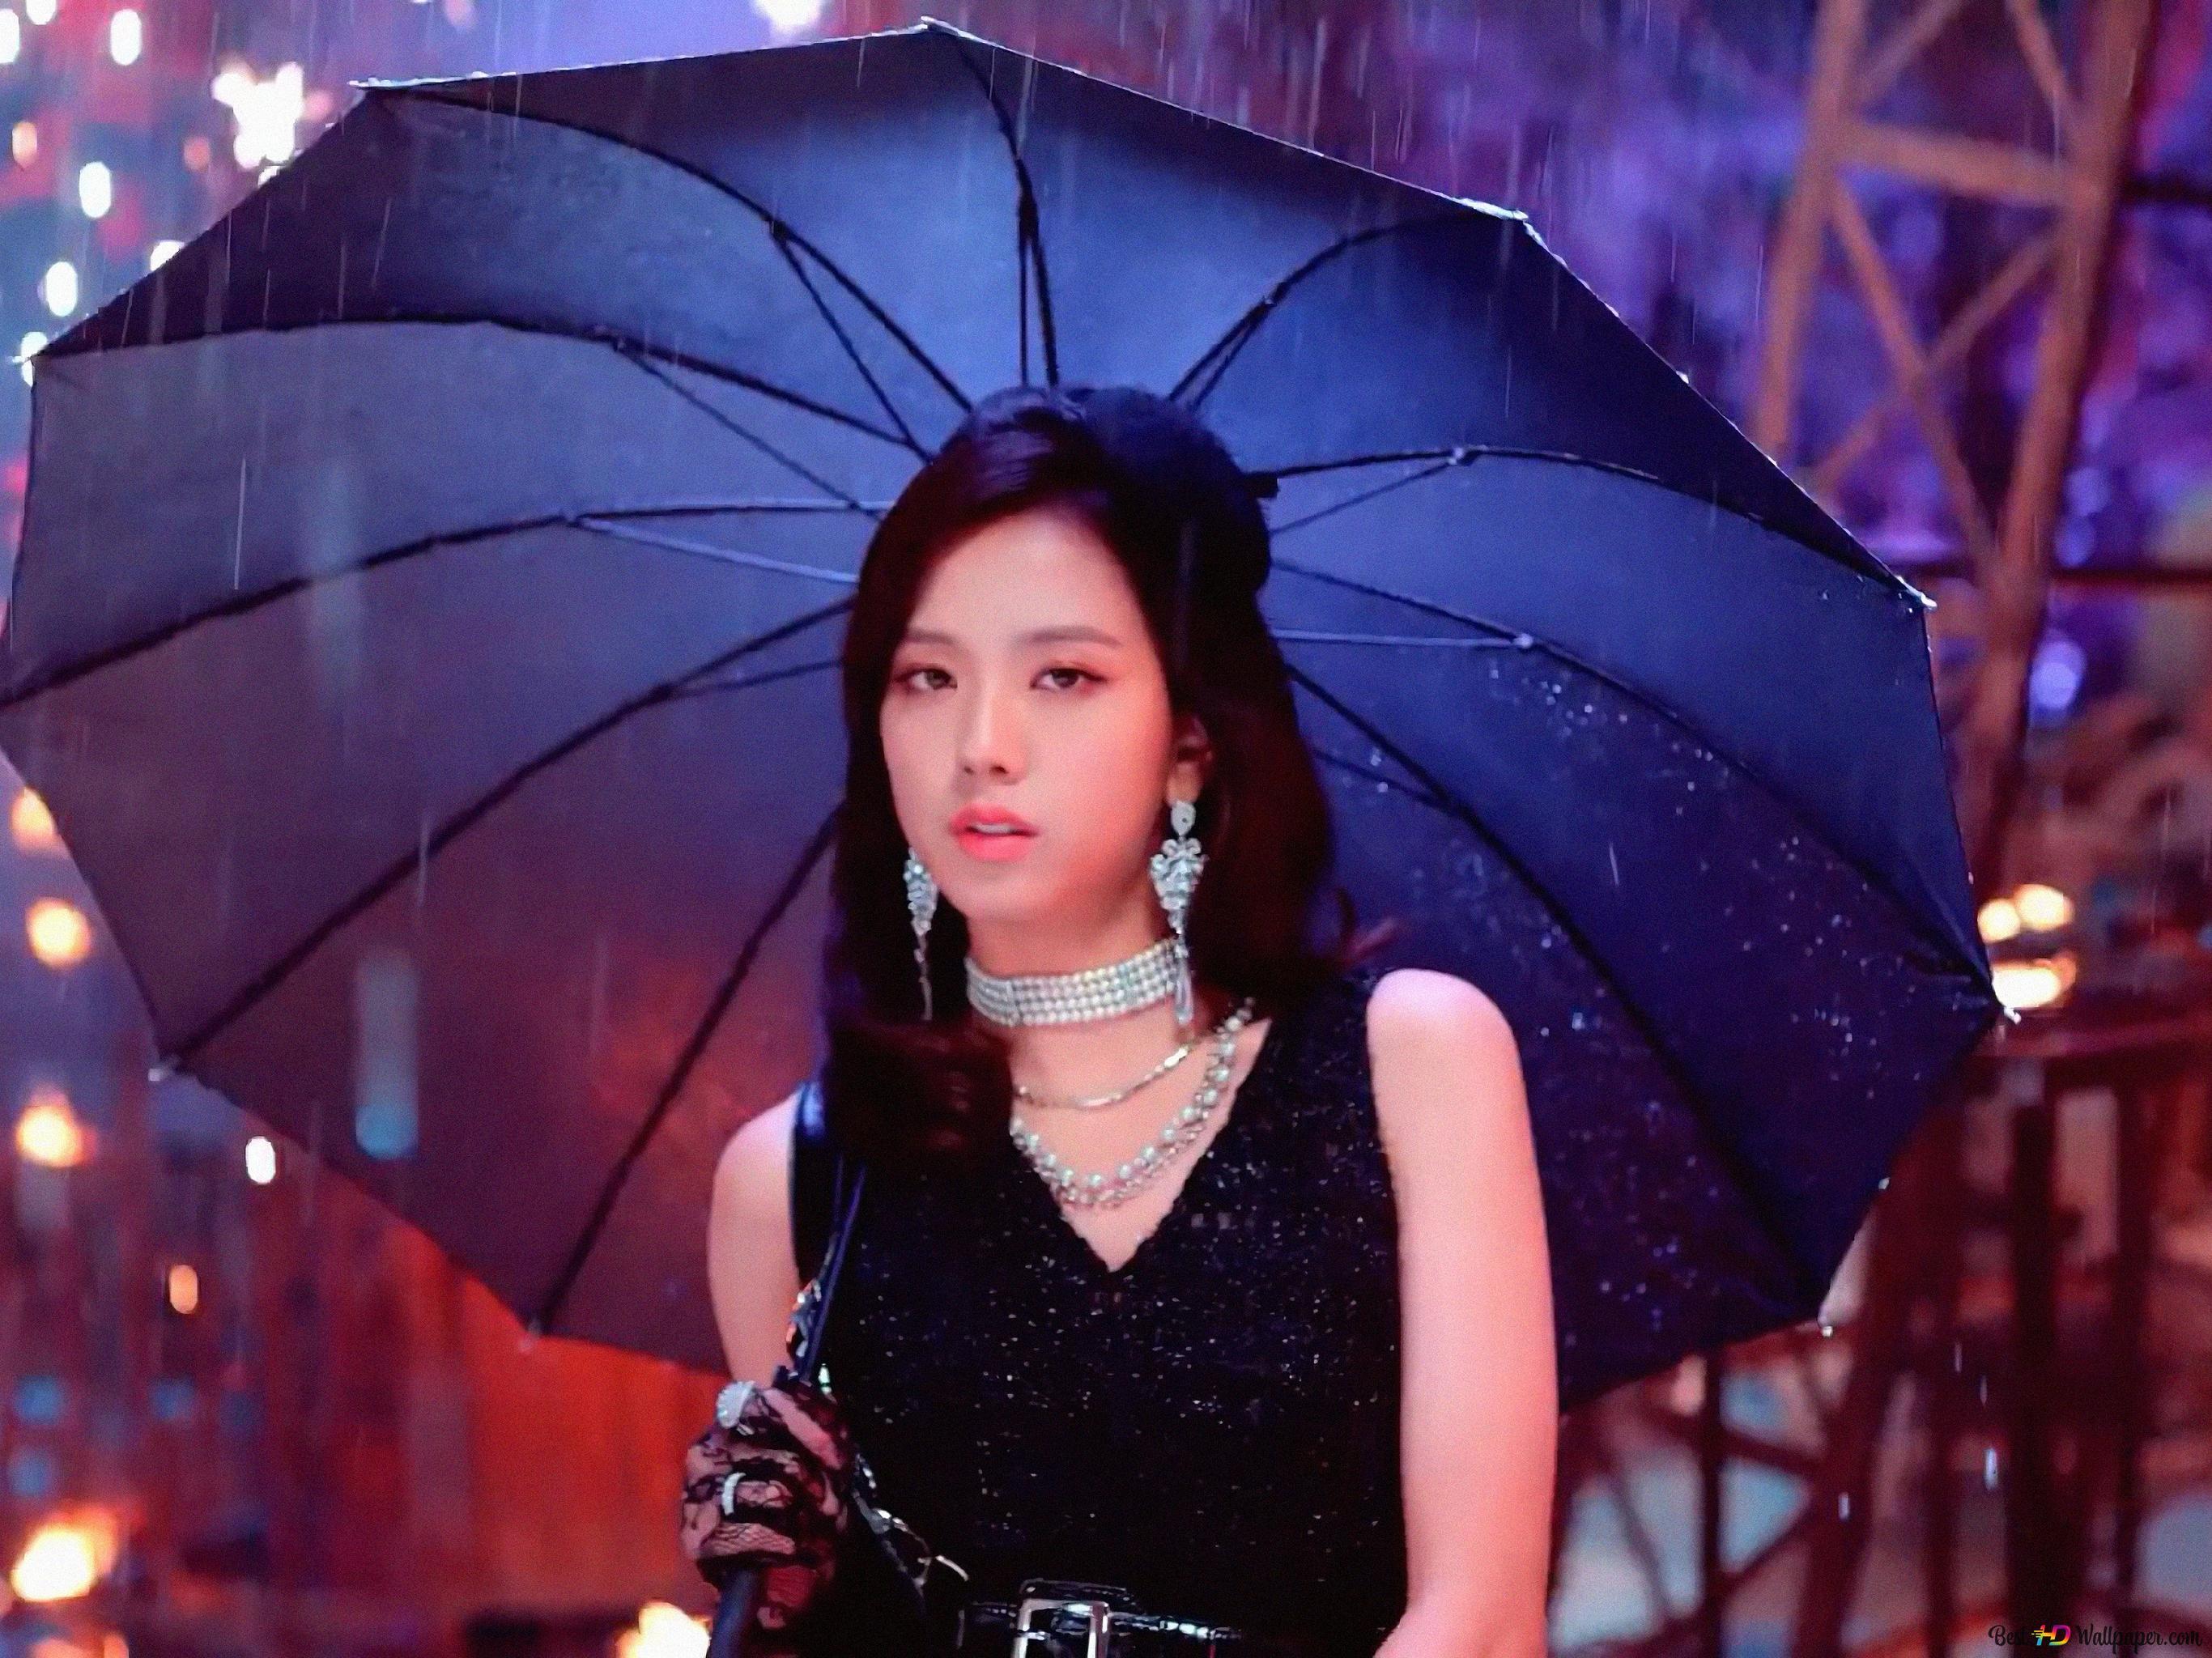 Gorgeous Singer Jisoo From Blackpink Hd Wallpaper Download